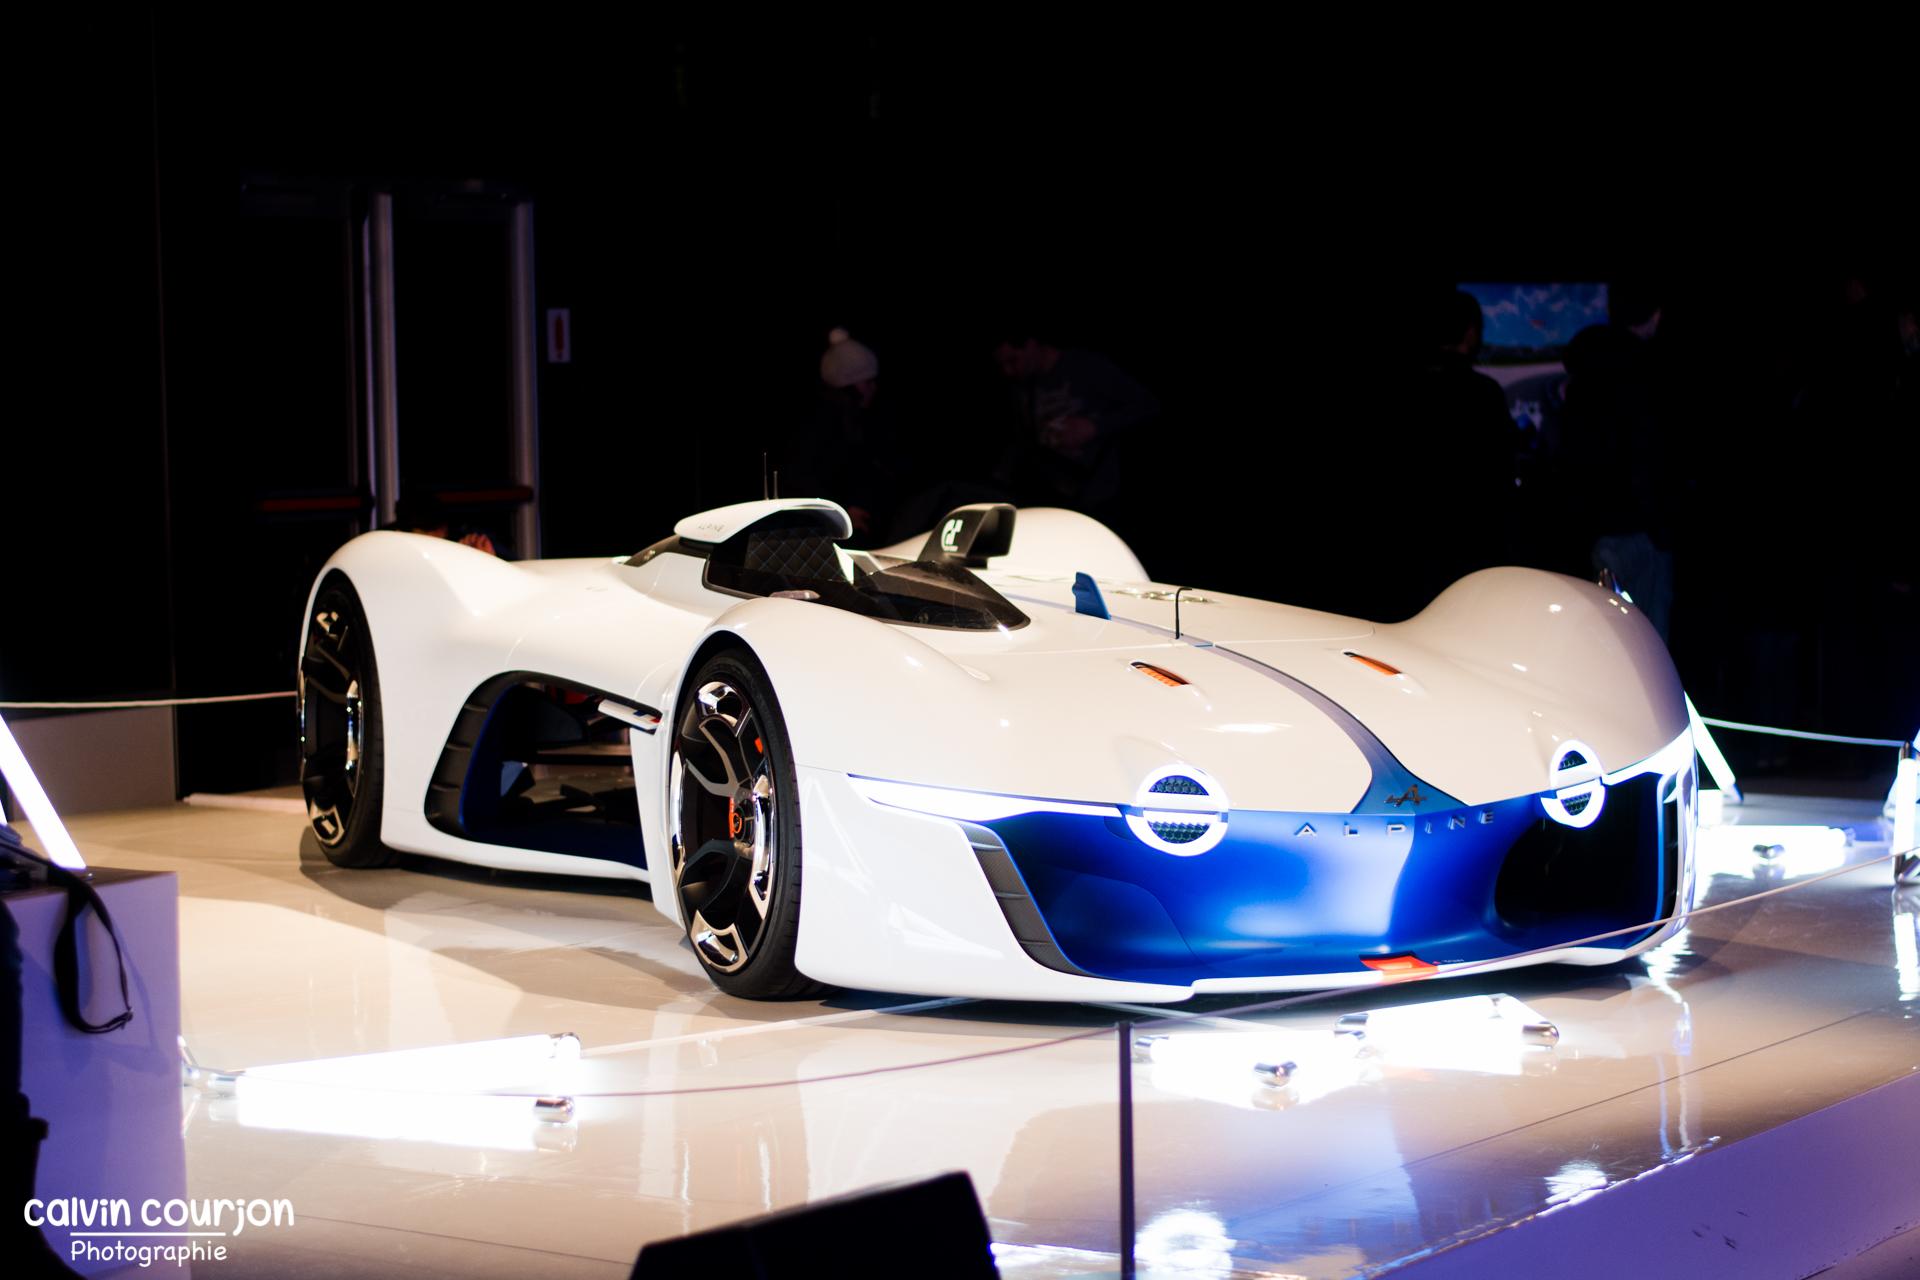 Alpine Vision GT - FAI 2015 - Paris - Calvin Courjon Photographie